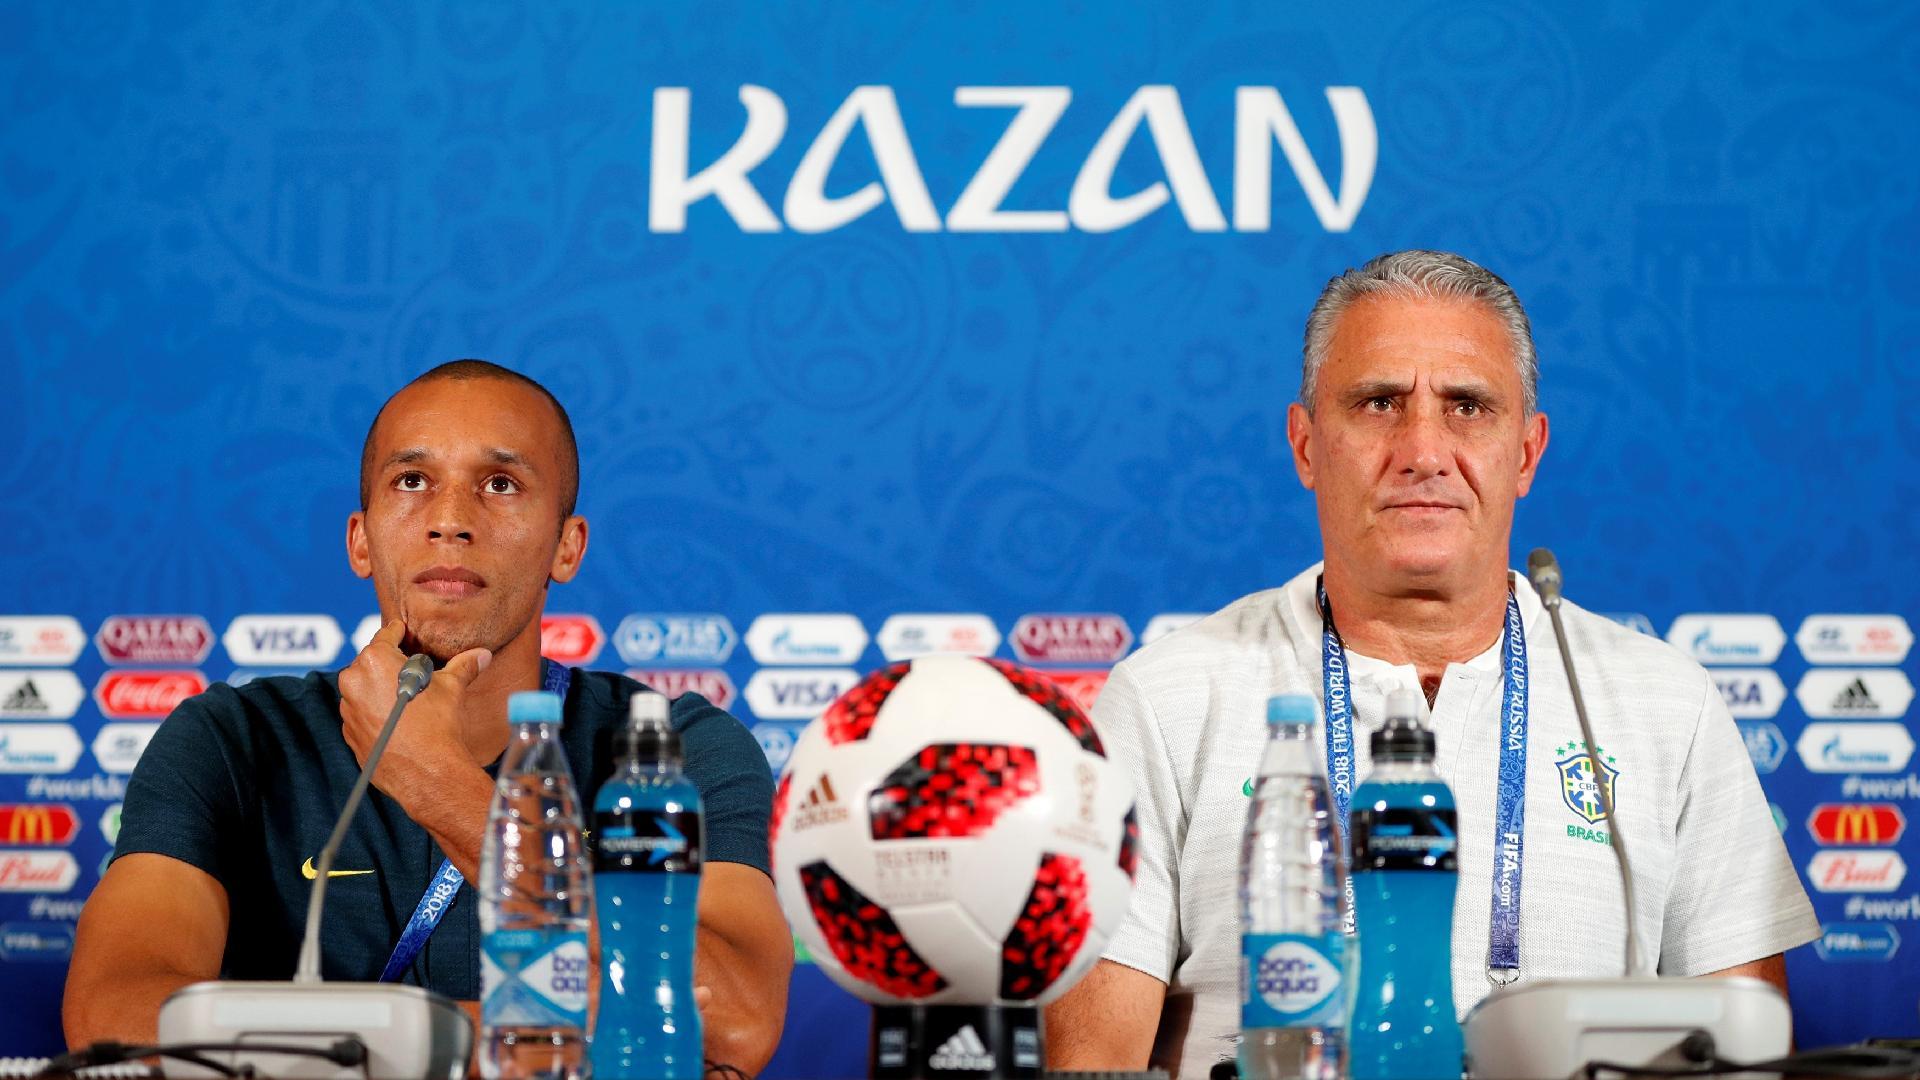 Tite e Miranda concedem entrevista coletiva no estádio de Kazan